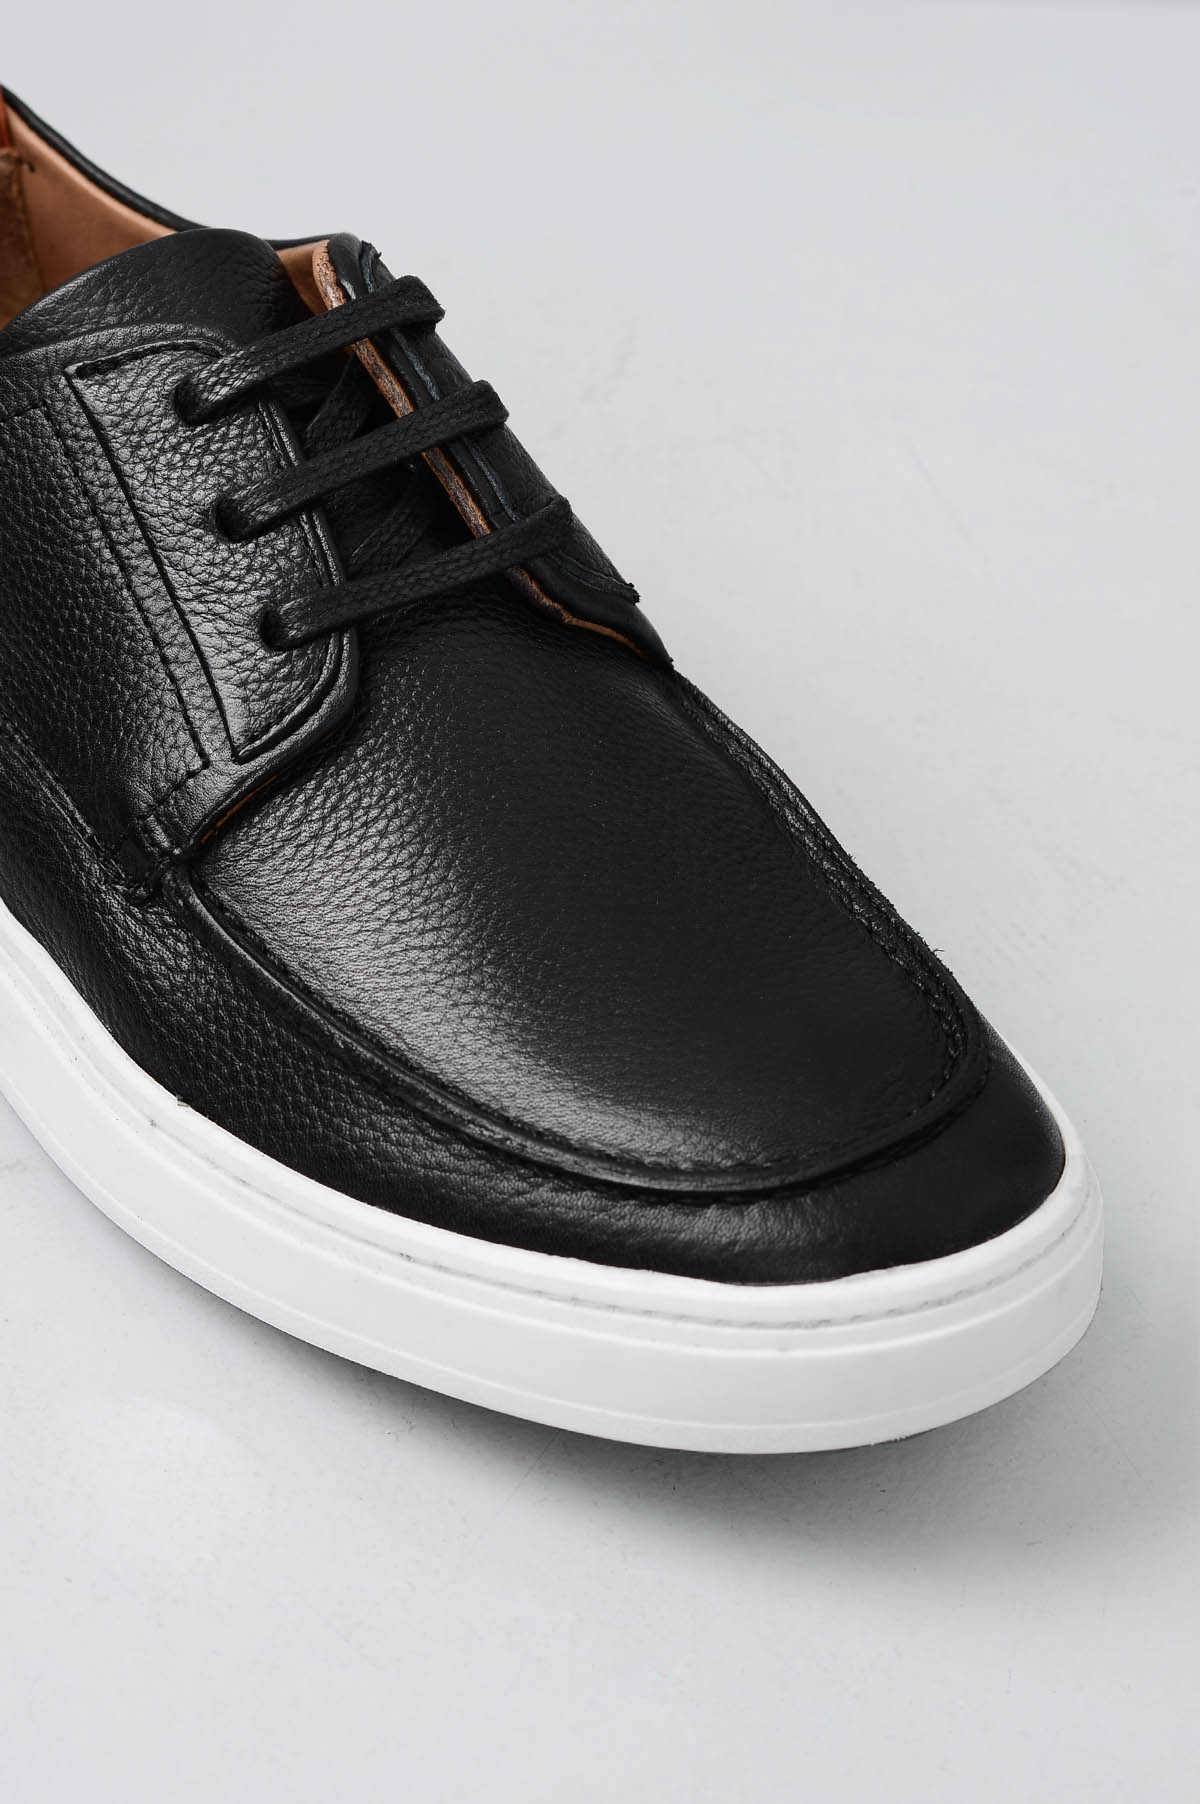 1c56400fcfff7 Sapatênis Masculino Renato Mundial CR-PRETO - Mundial Calçados